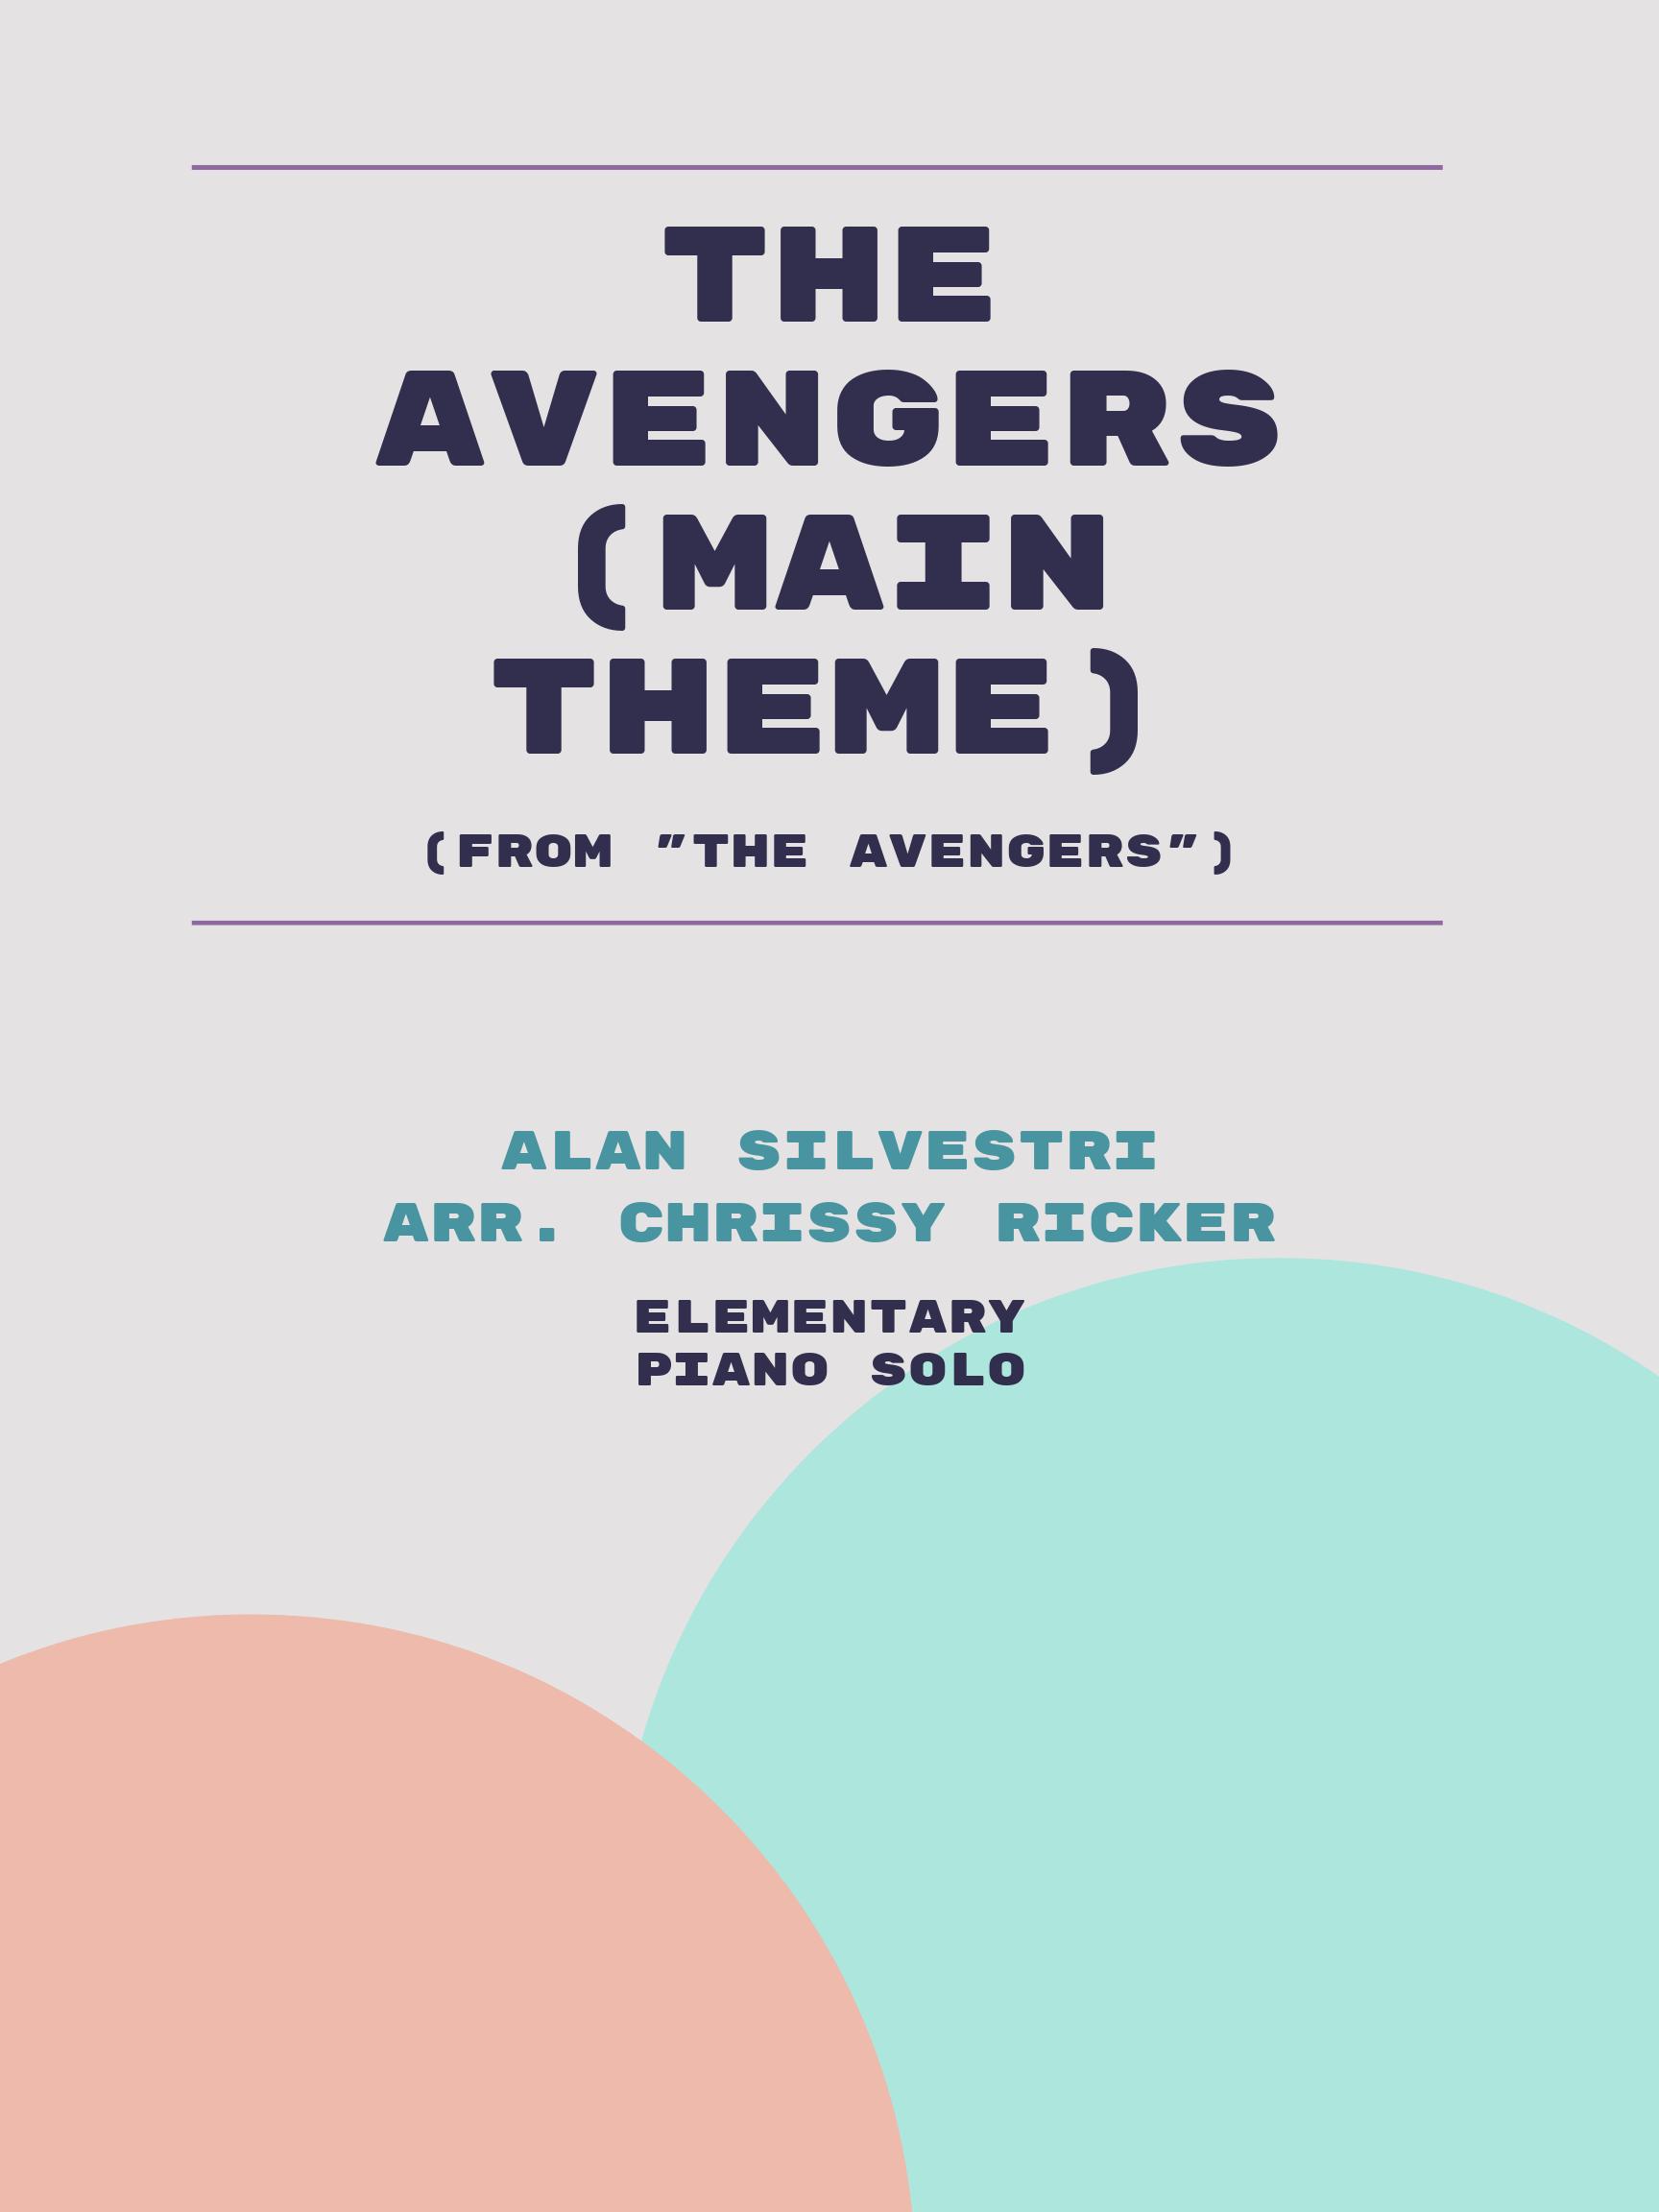 The Avengers (Main Theme) by Alan Silvestri